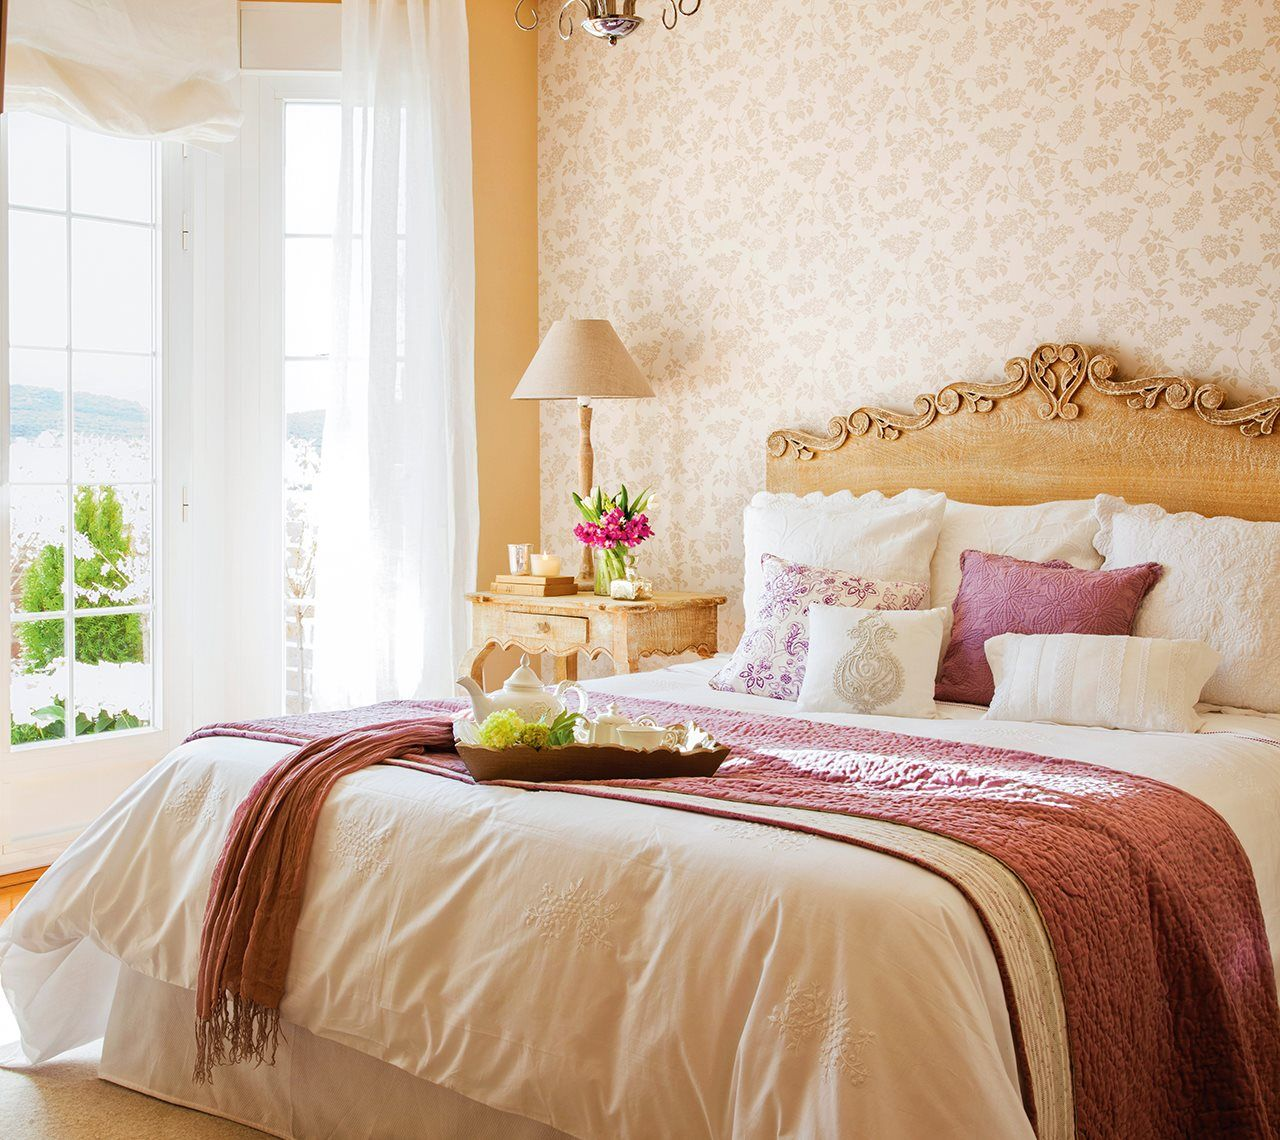 Las mejores ideas para renovar tu dormitorio elmueble for Papel pared habitacion matrimonio